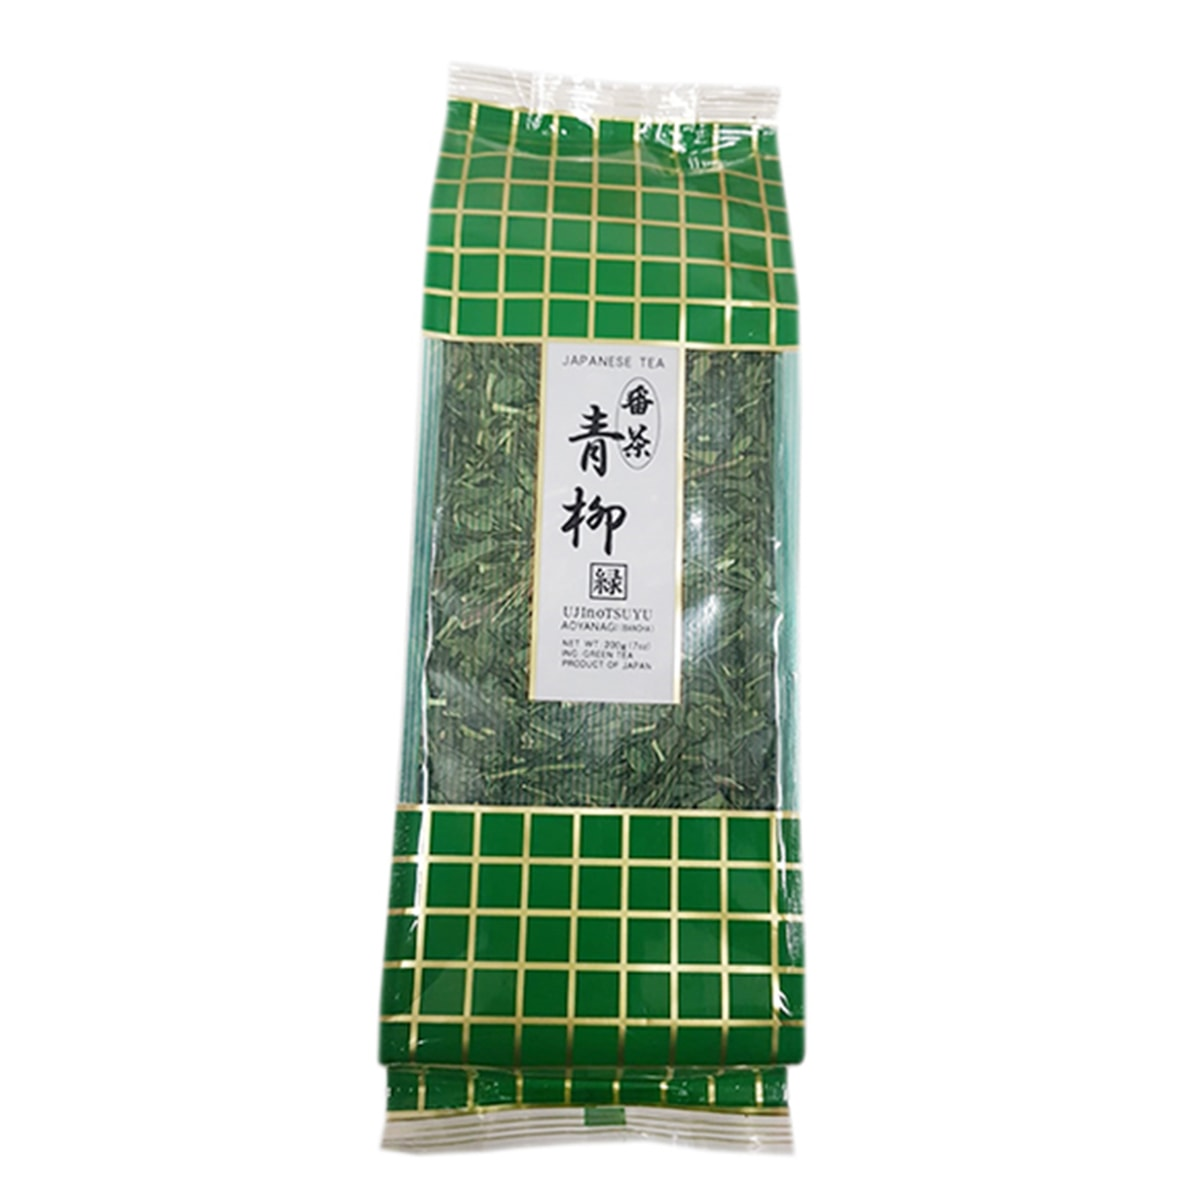 Buy Ujinotsuyu Japanese Green Tea Loose (Aoyanagi Green) - 200 gm